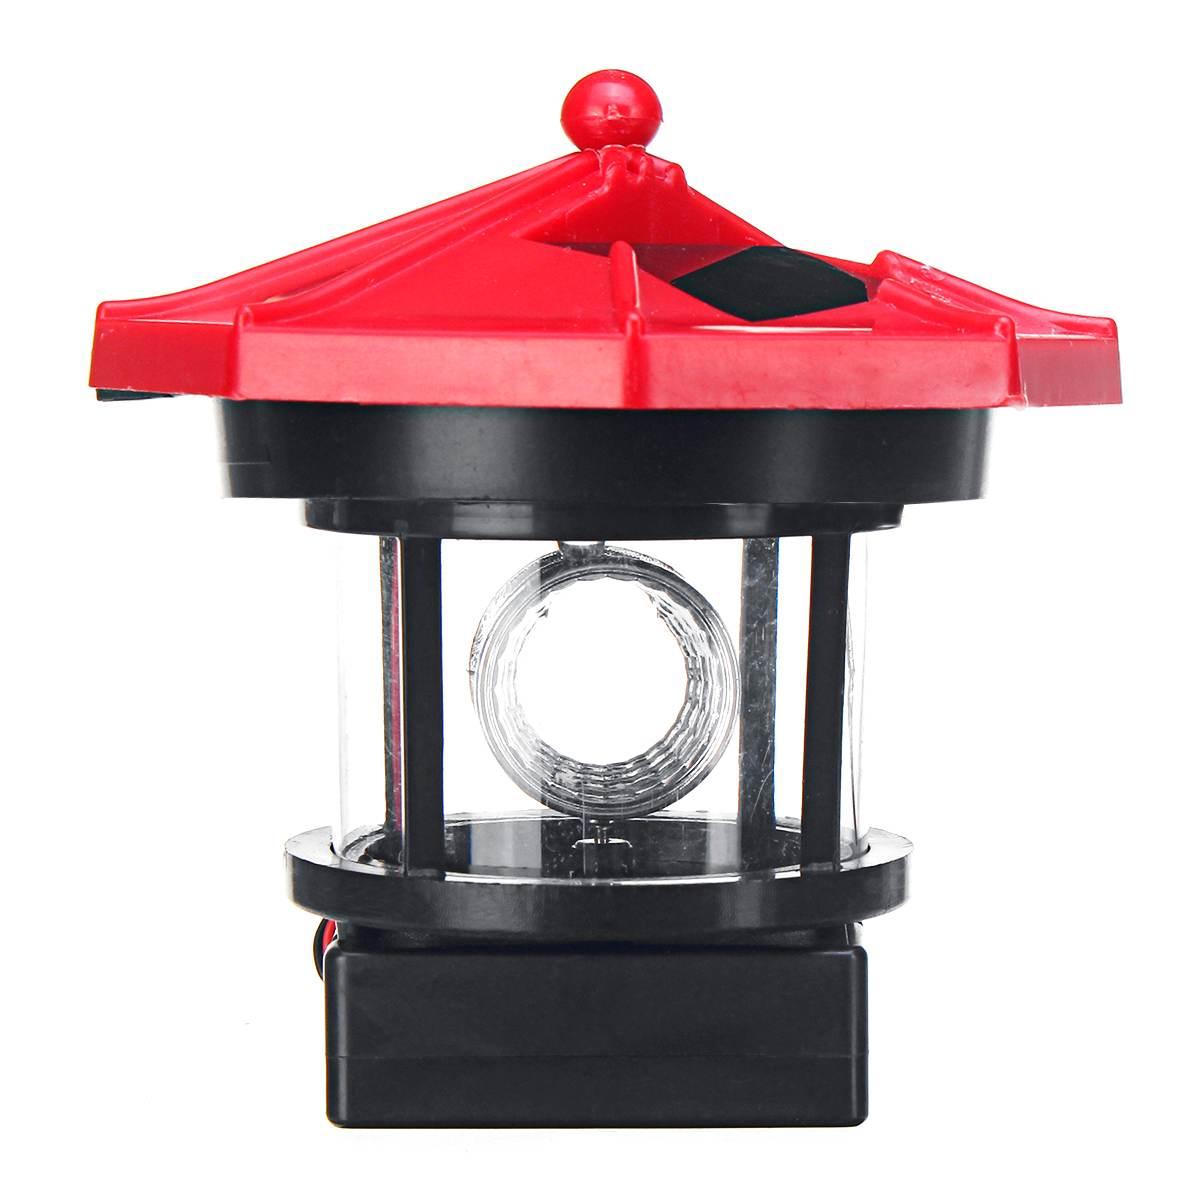 Smuxi LED Solar ed Resin Lighthouse Statue Rotating Outdoor Garden Yard Lighting Decor Shines in Rotating Motion 9x5x9.9cm